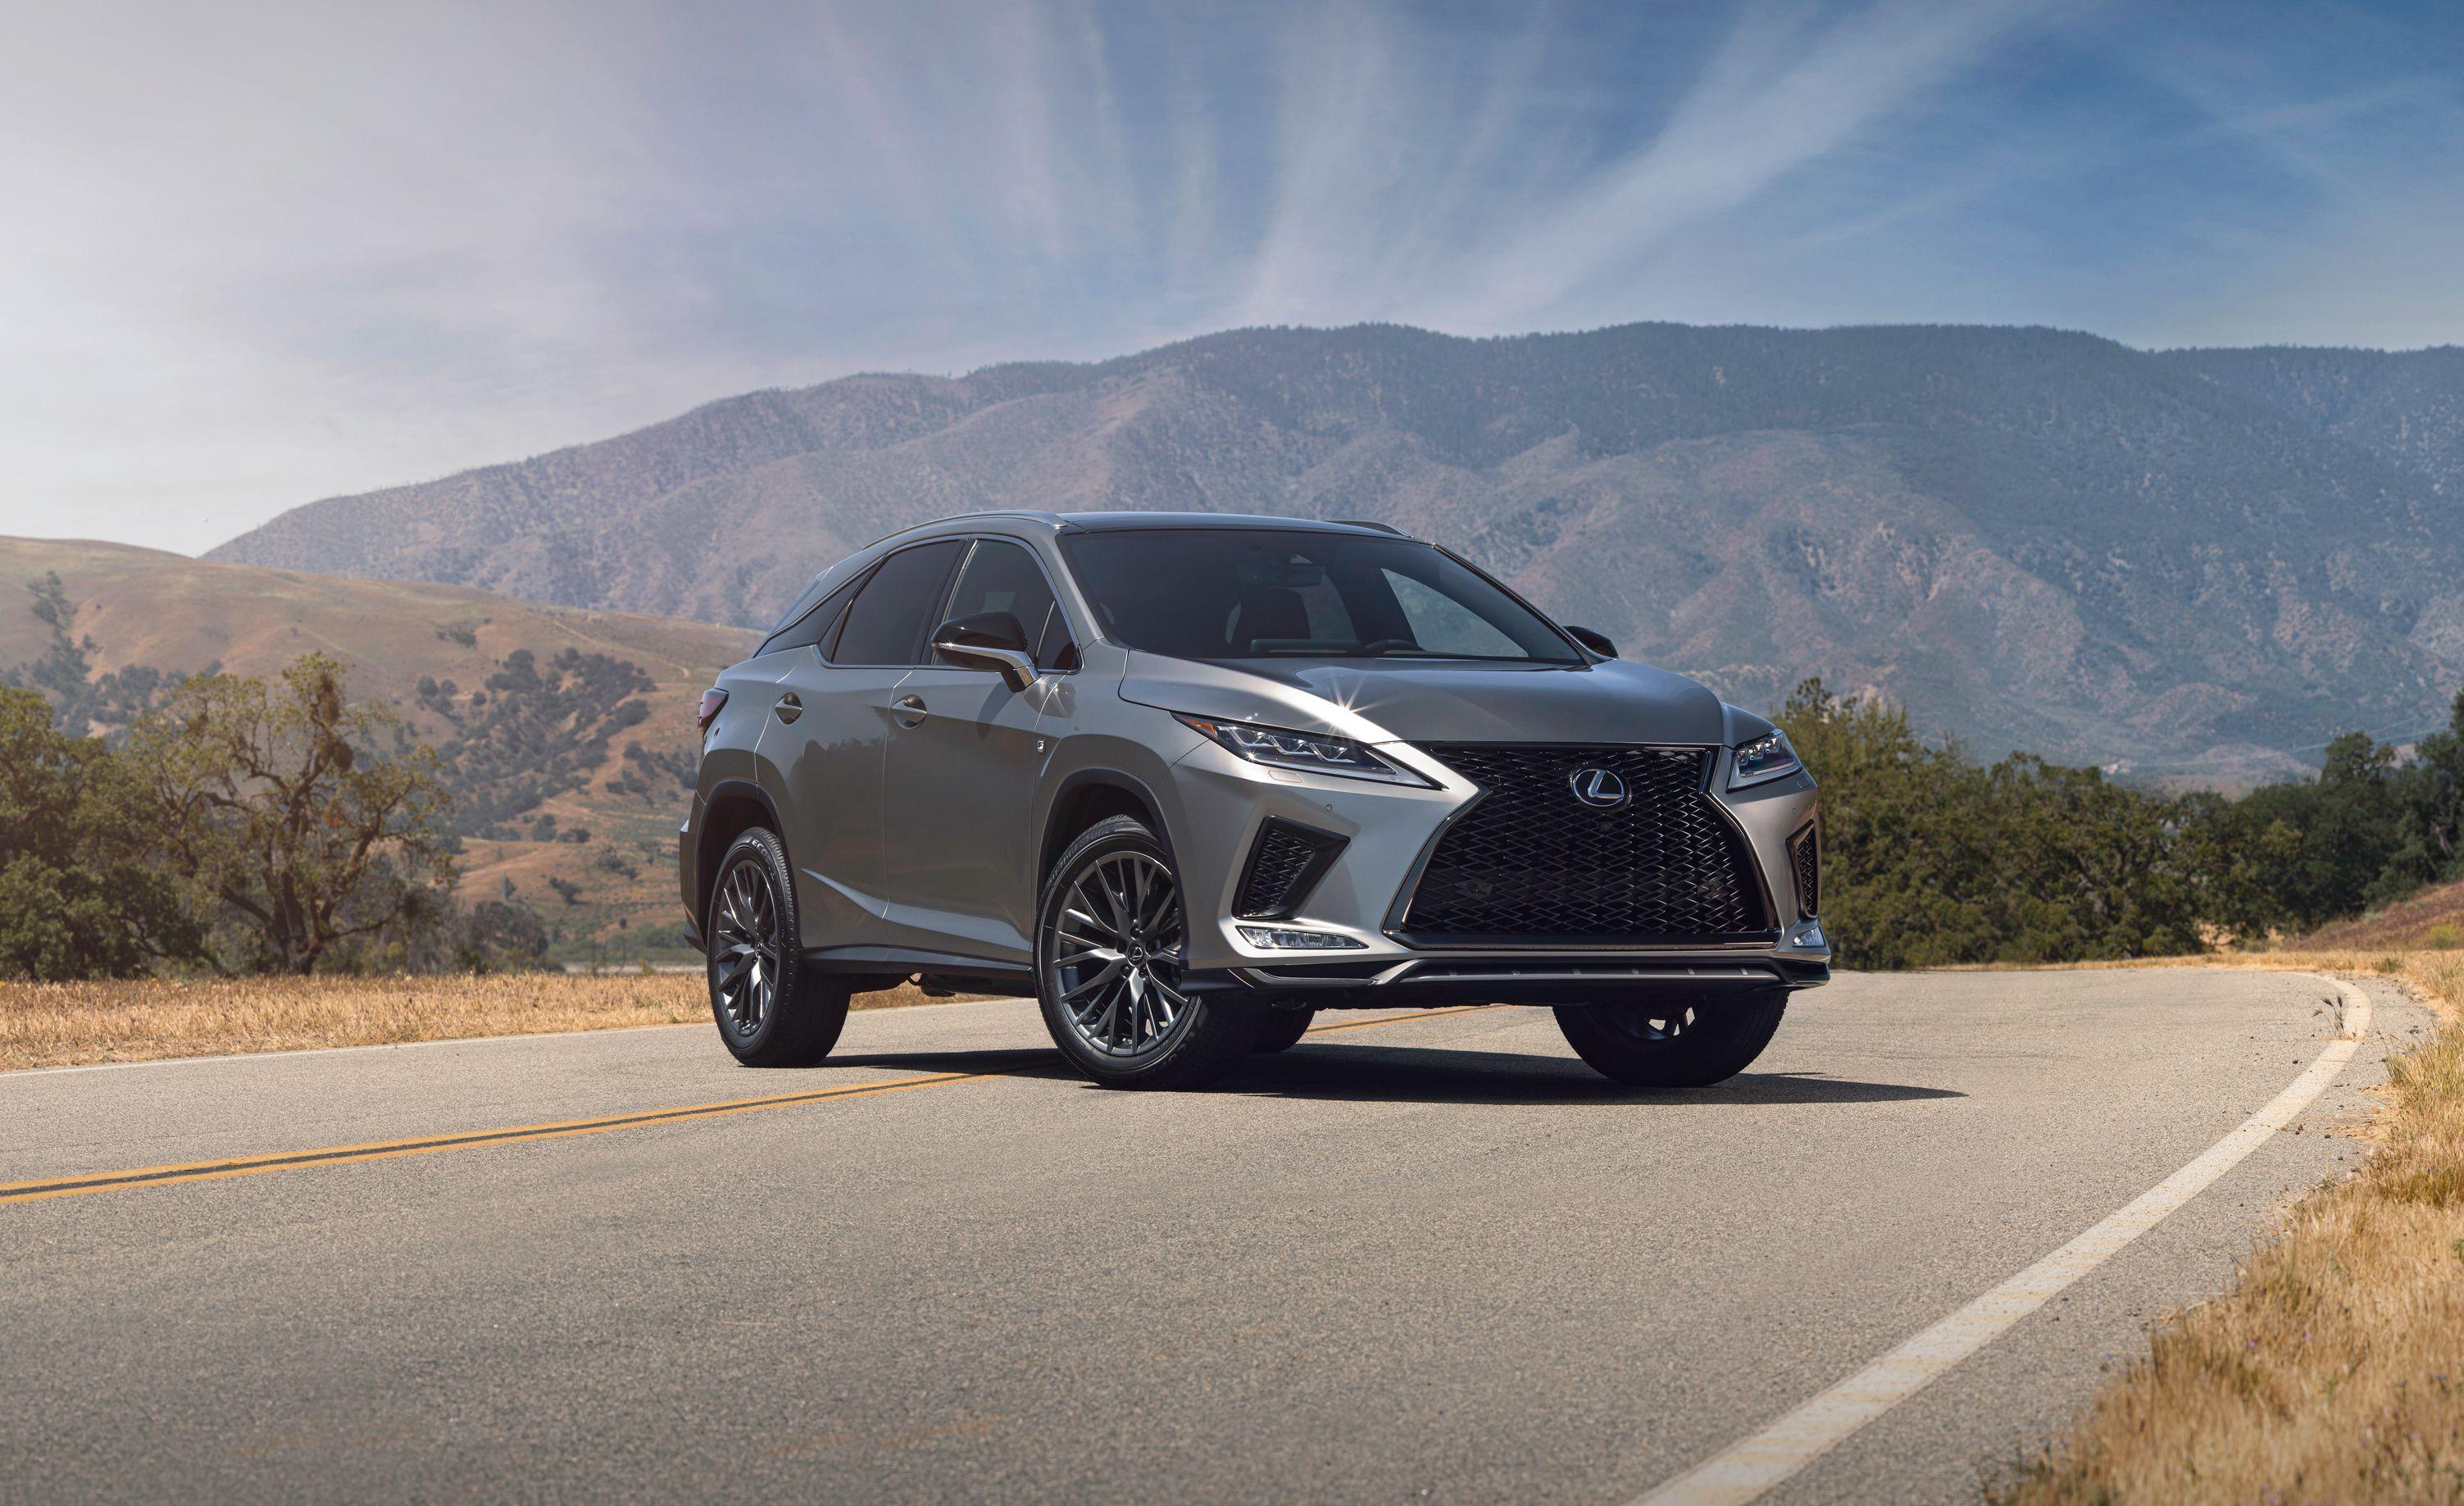 Car Industry Latest News Updates Autodeals Pk In 2020 Lexus Gx Lexus Suv Lexus